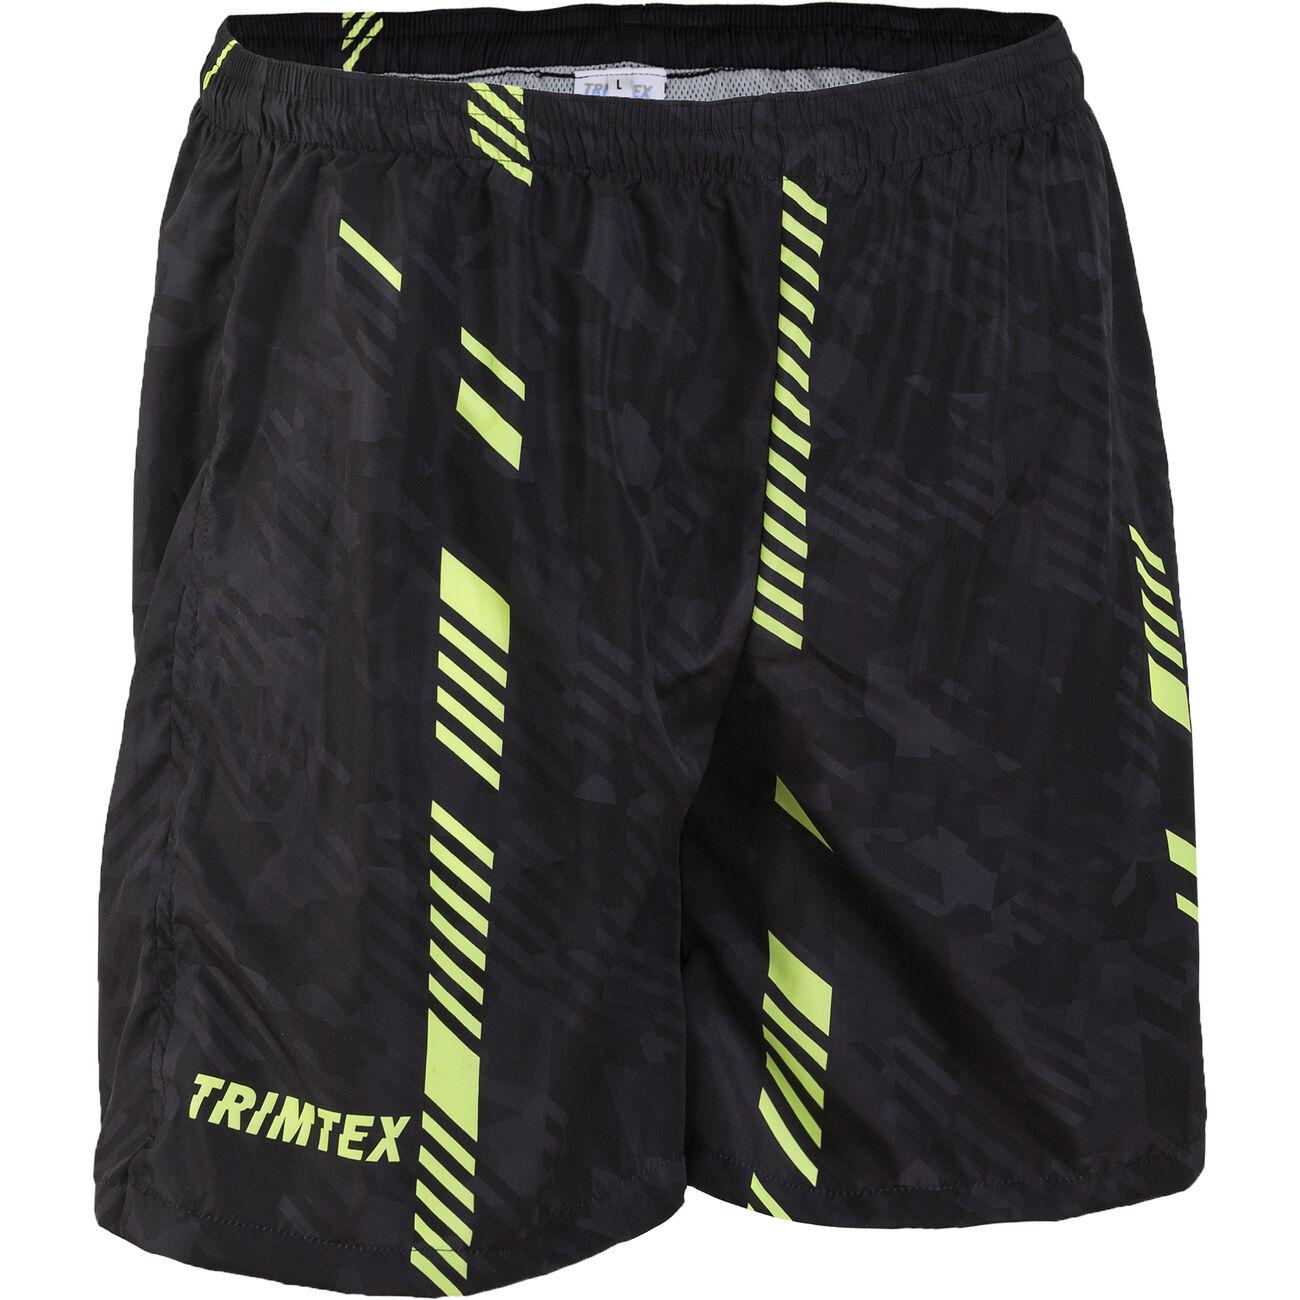 Free shorts